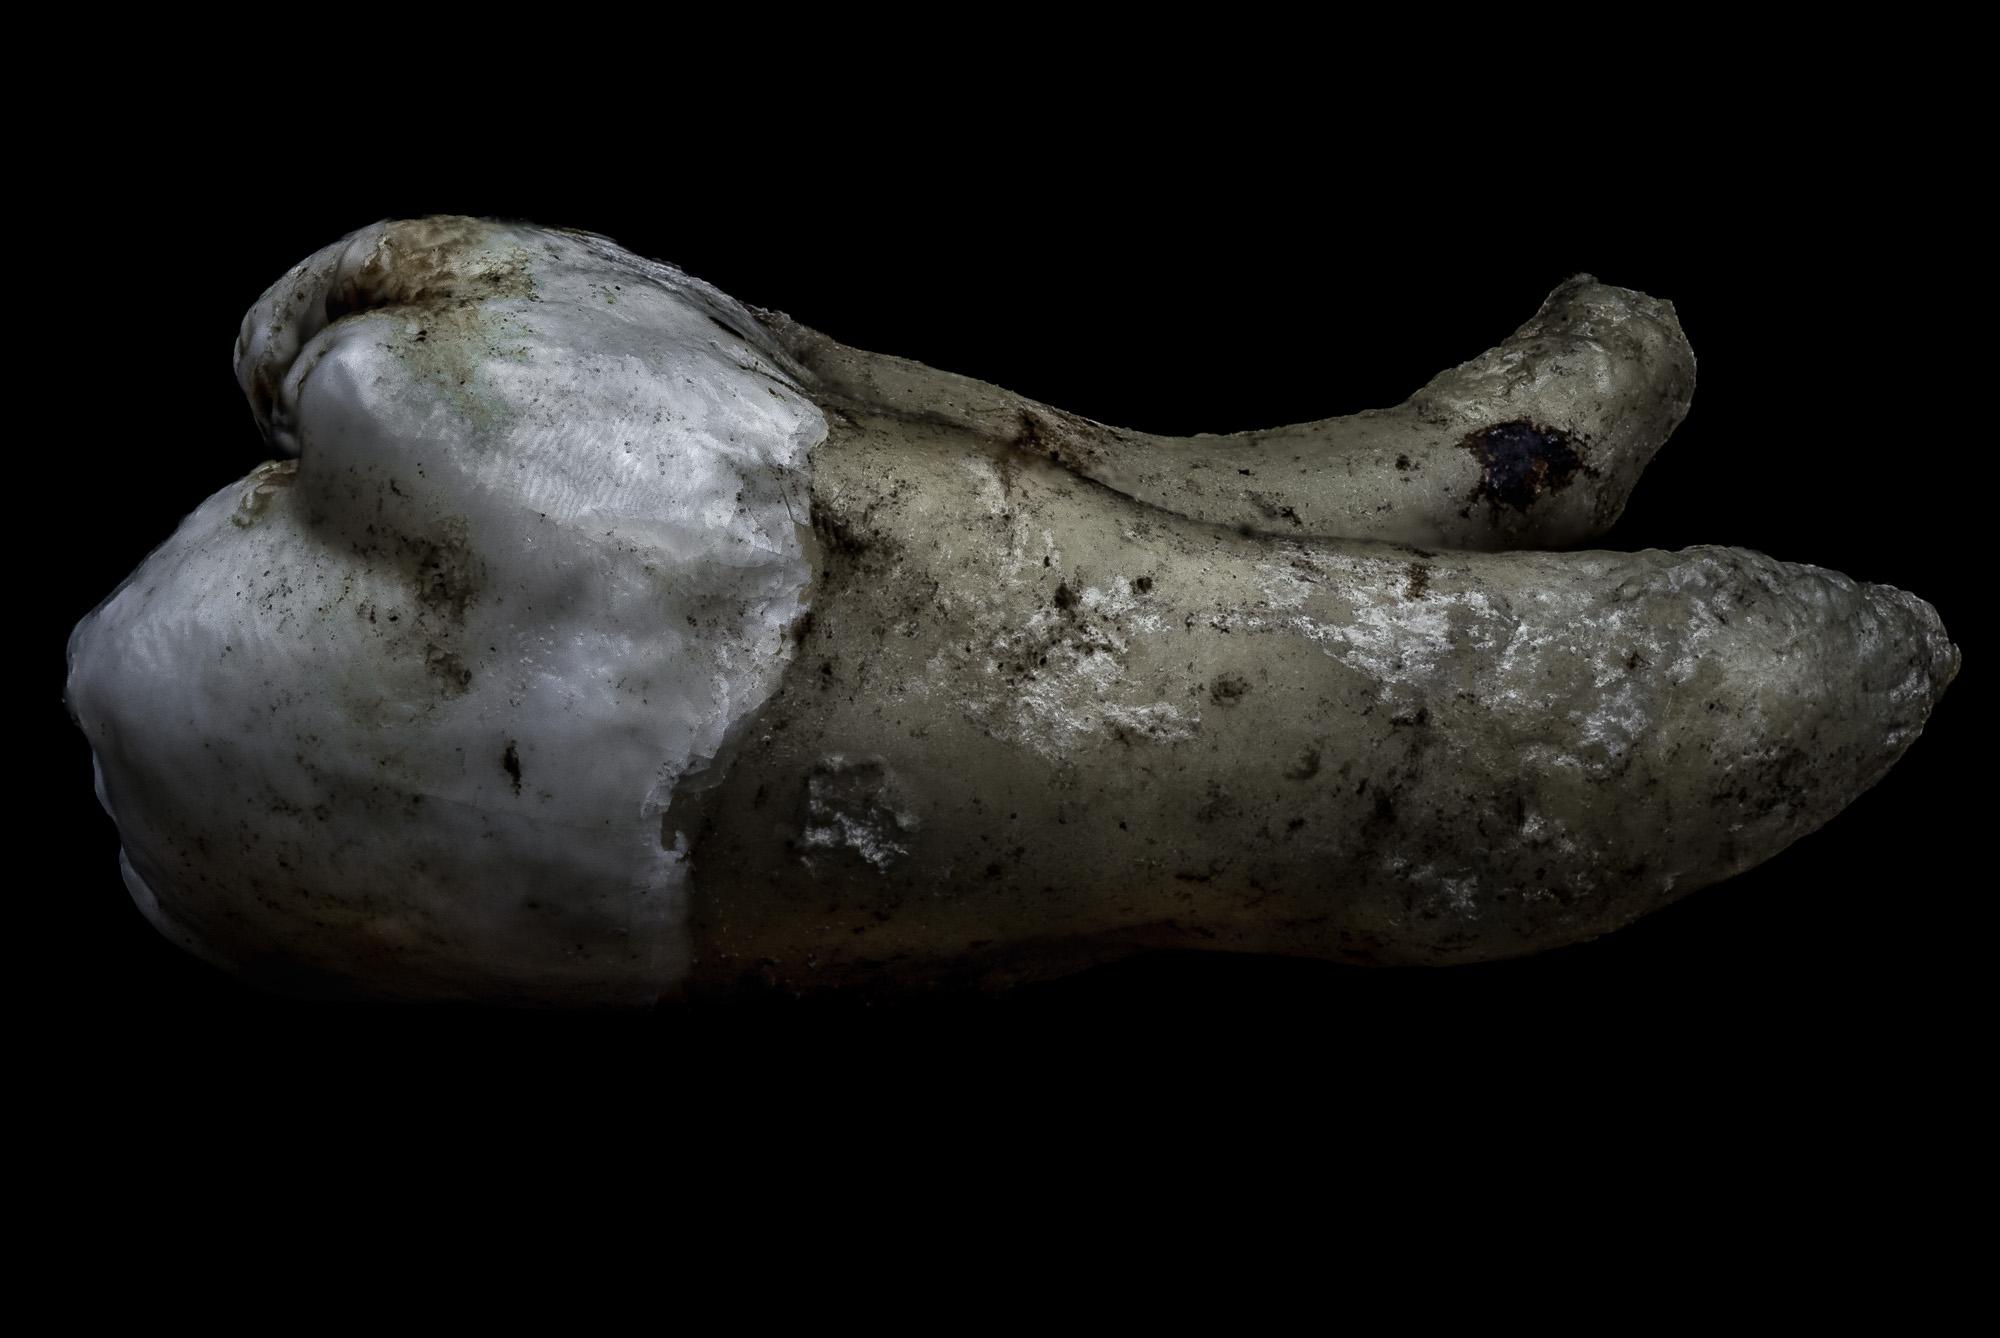 neal-auch-human-teeth-photographs-8.jpg